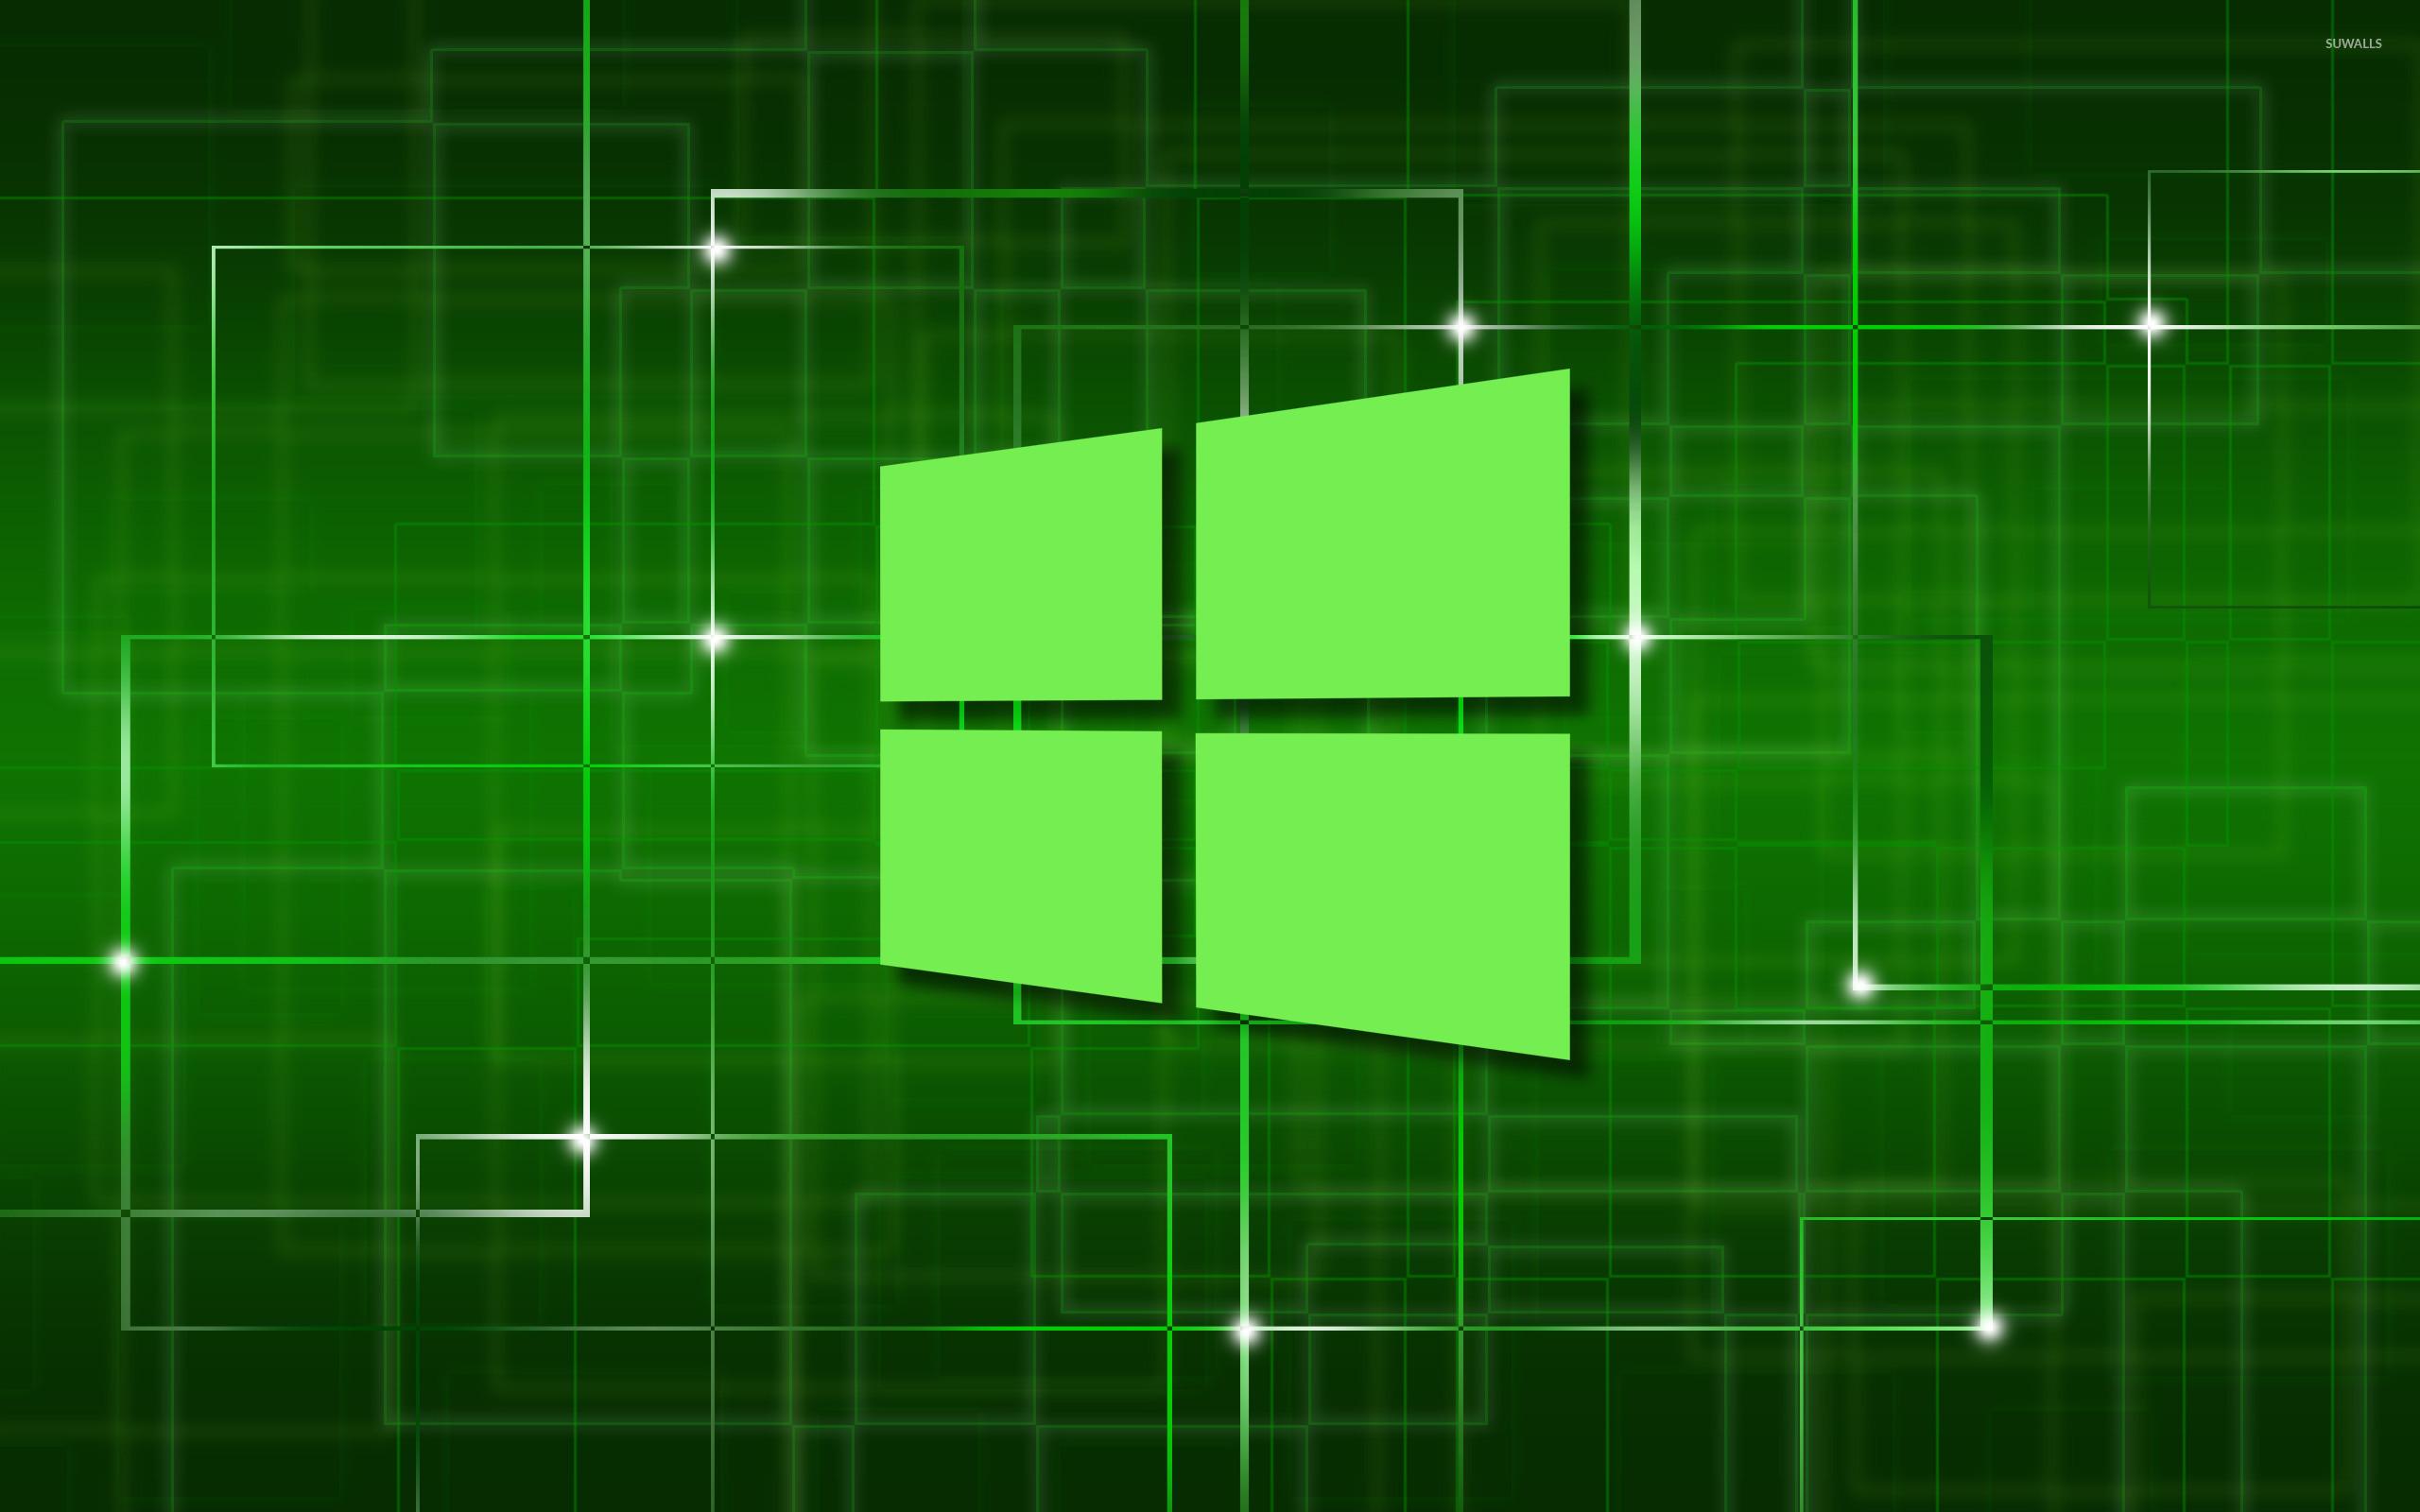 Windows 10 green simple logo on a network wallpaper 1680x1050 1680x1050